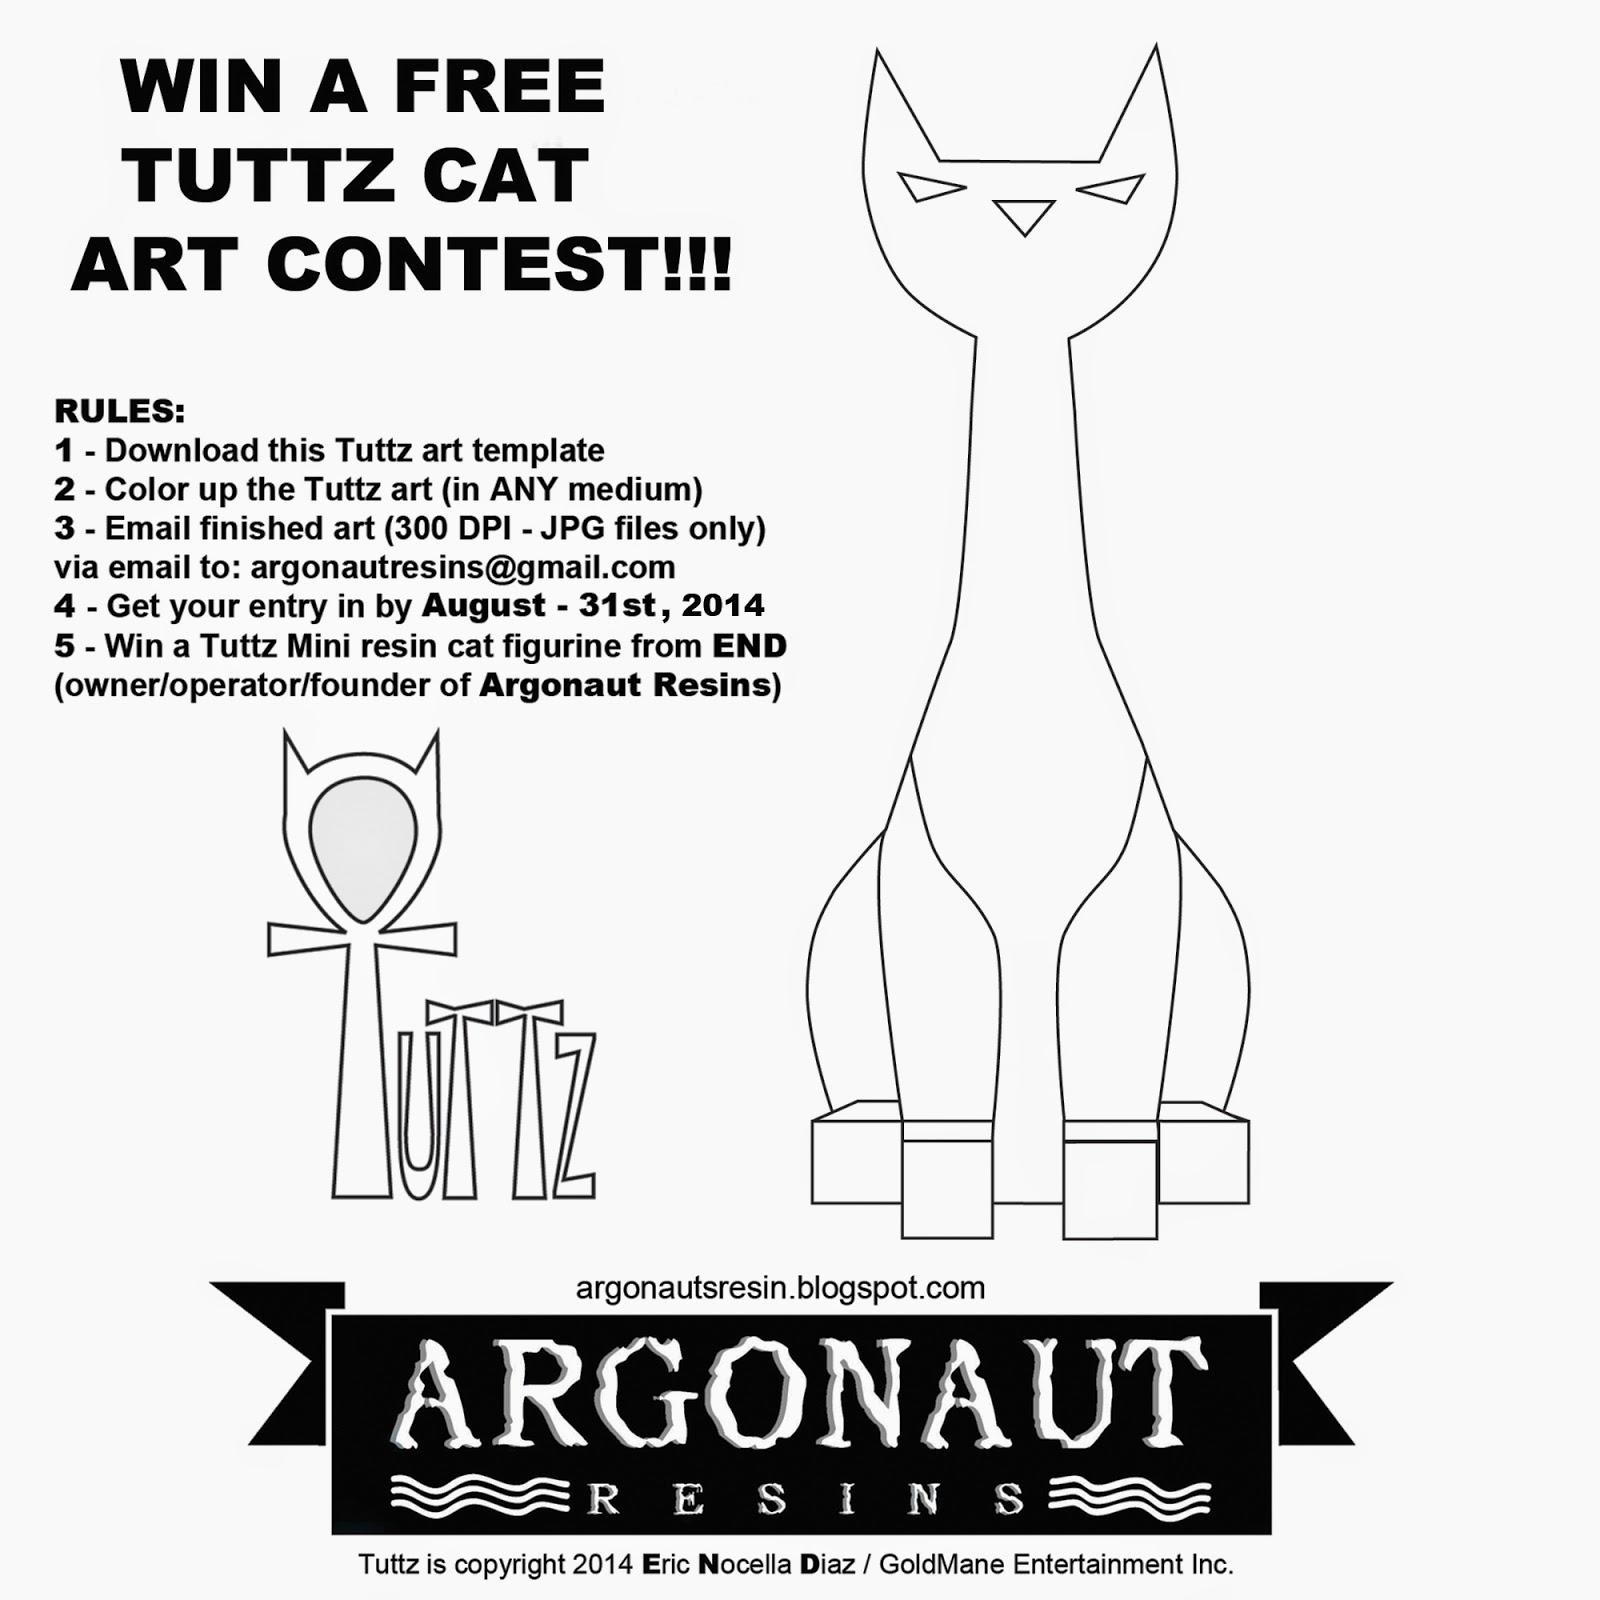 Argonauts resin win a free tuttz mini art contest pronofoot35fo Images